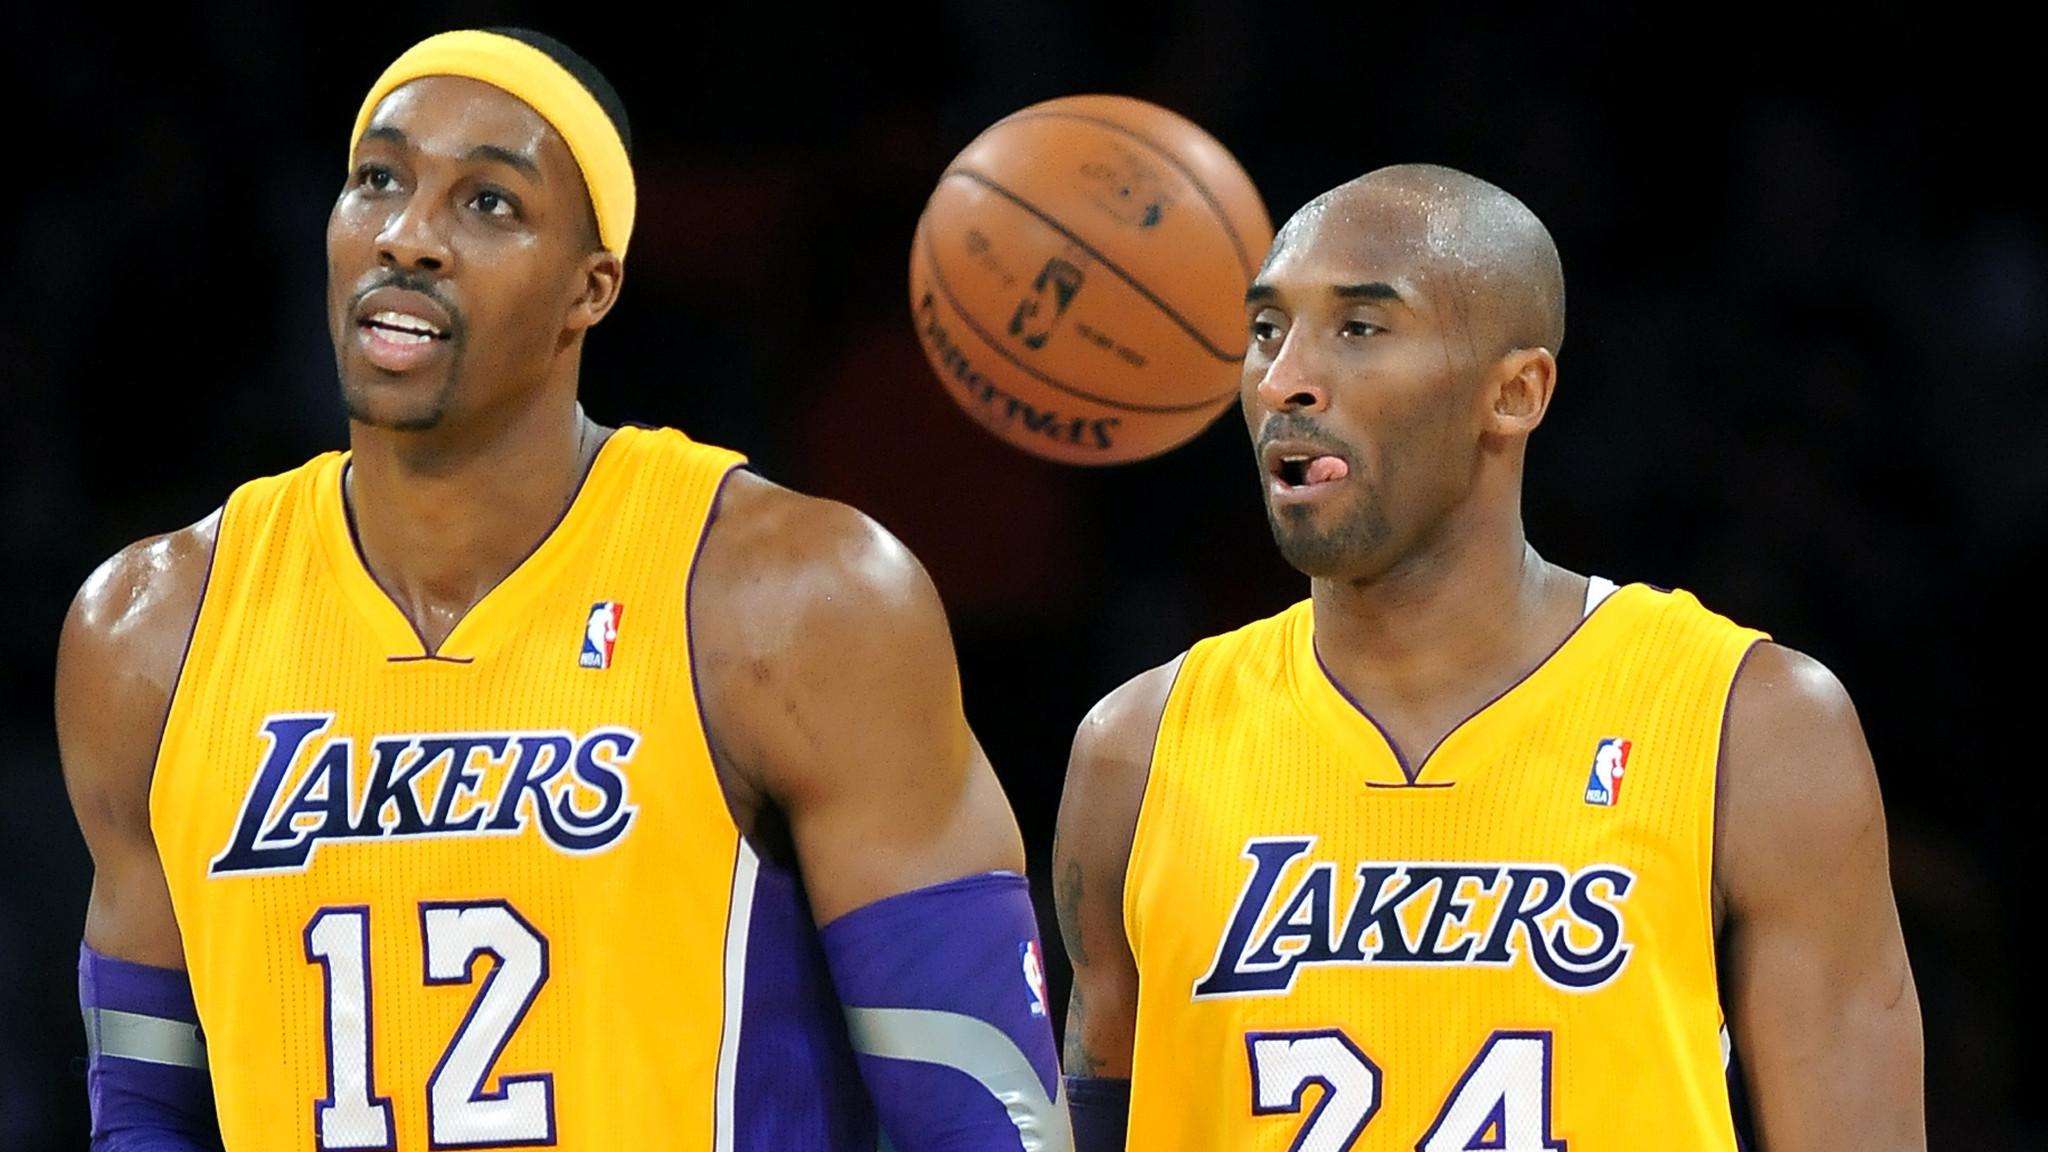 Kobe Bryant and Dwight Howard